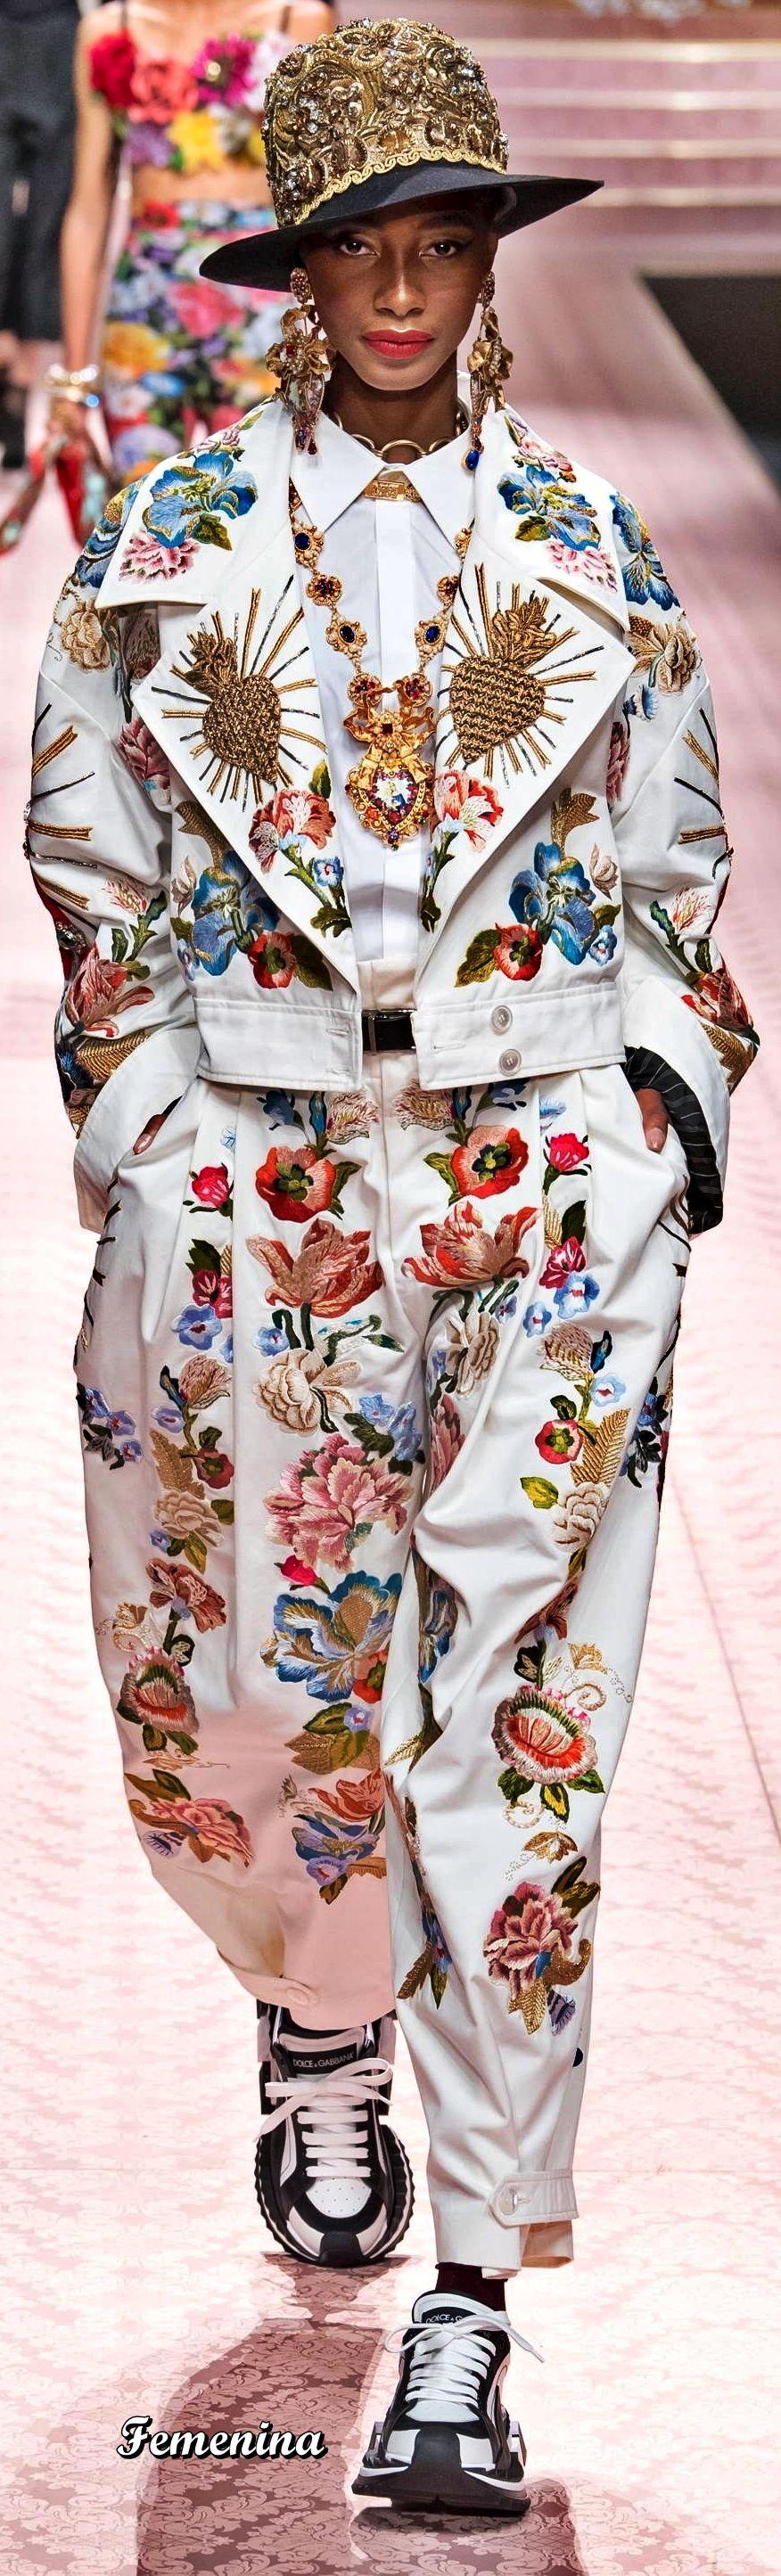 Dolce u Gabbana SpringSummer Victim of Apparel Addiction in